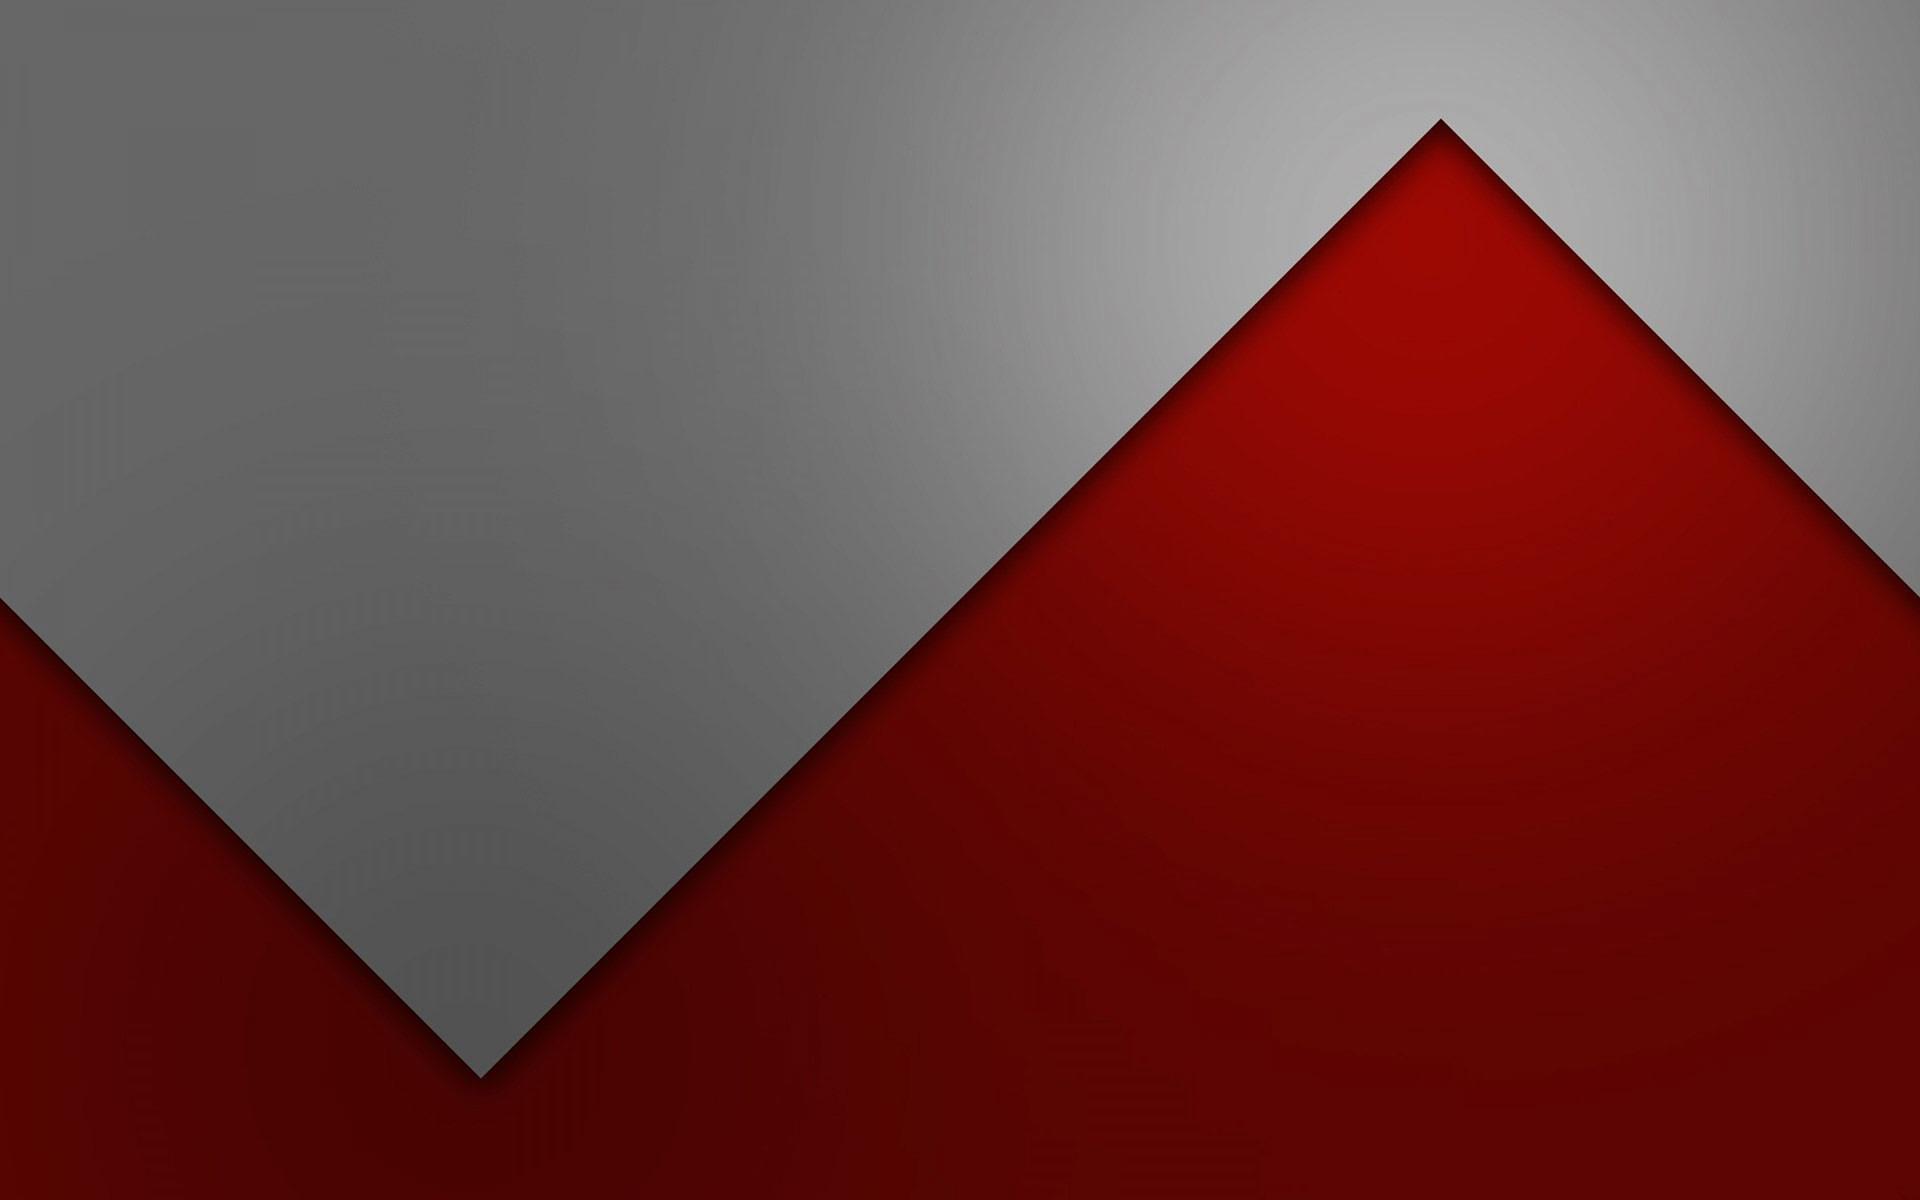 Red Wallpaper 15